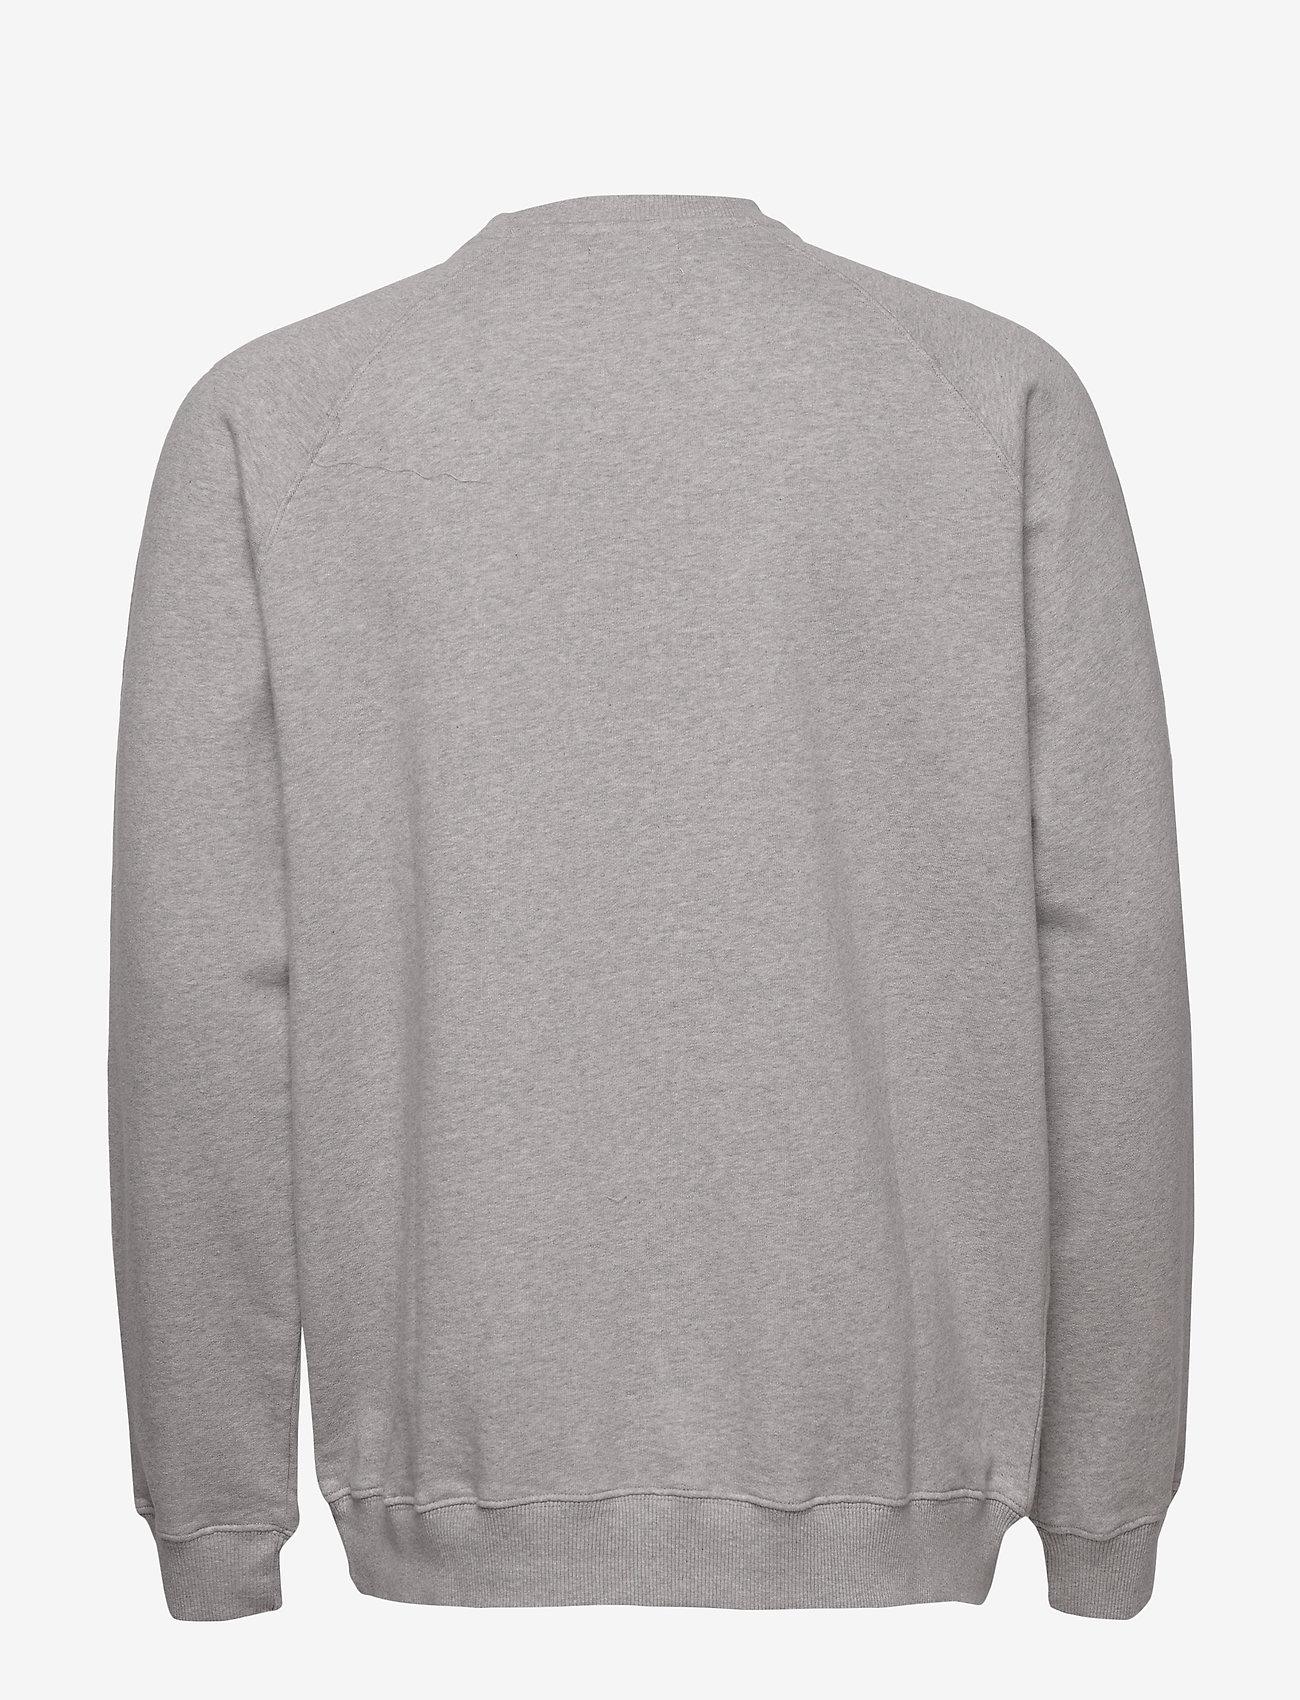 Forét SPRUCE SWEATSHIRT - Sweatshirts LIGHTGREY MELANGE - Menn Klær